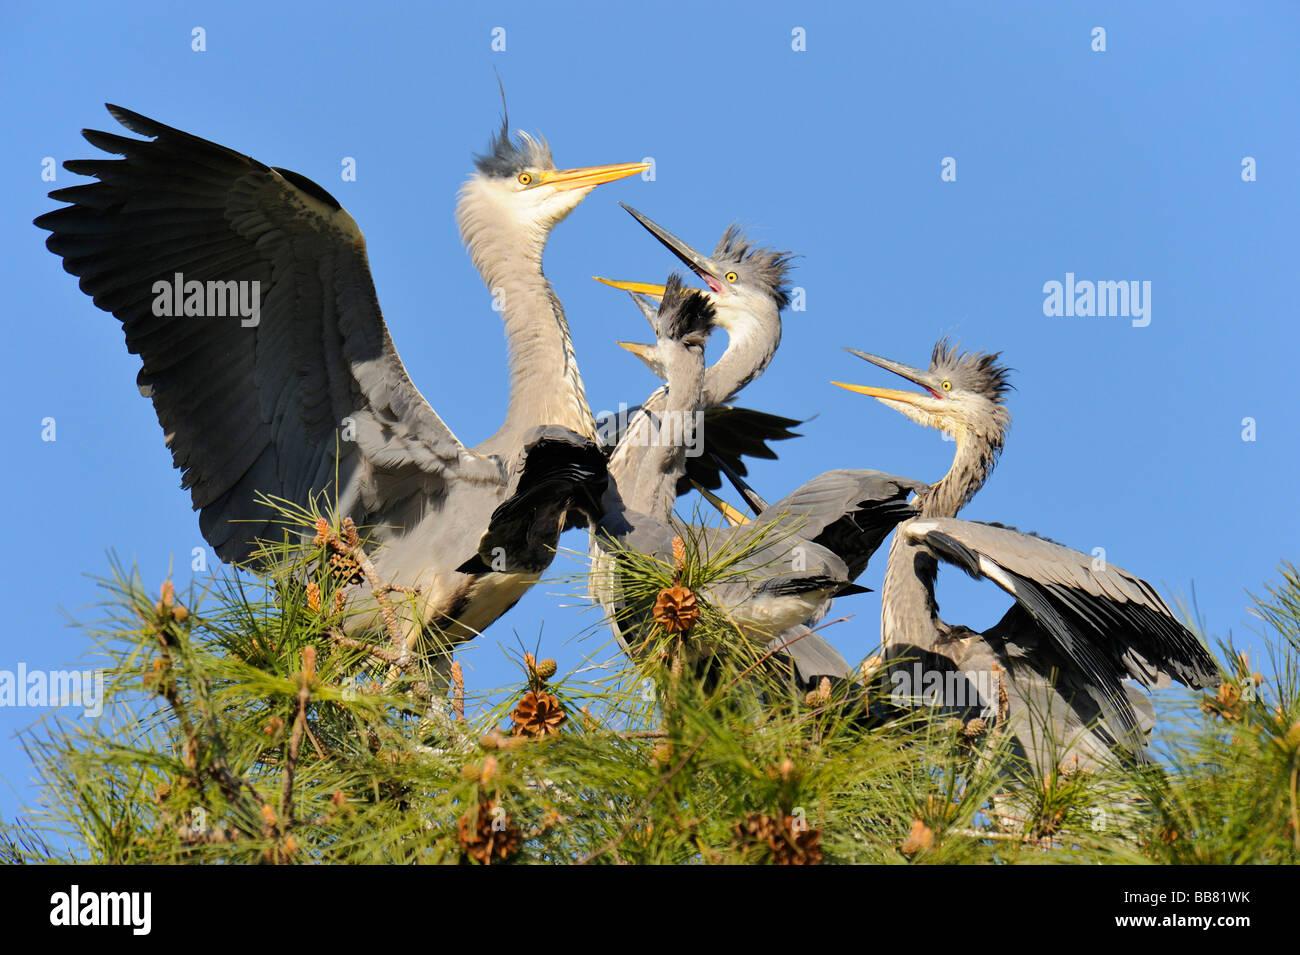 Grey Heron (Ardea cinerea), adult with fledglings - Stock Image